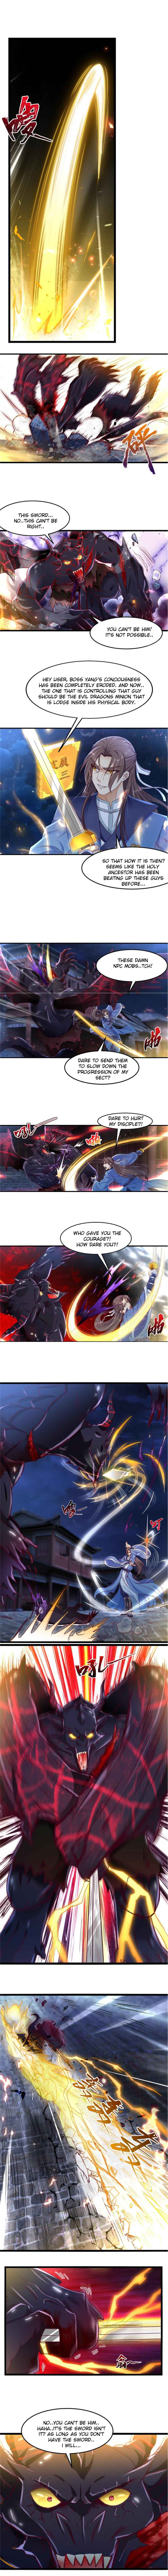 https://manga.mangadogs.com/comics/pic4/30/43678/3008228/41621ff11046c80c435fa90489a3a20d.jpg Page 1